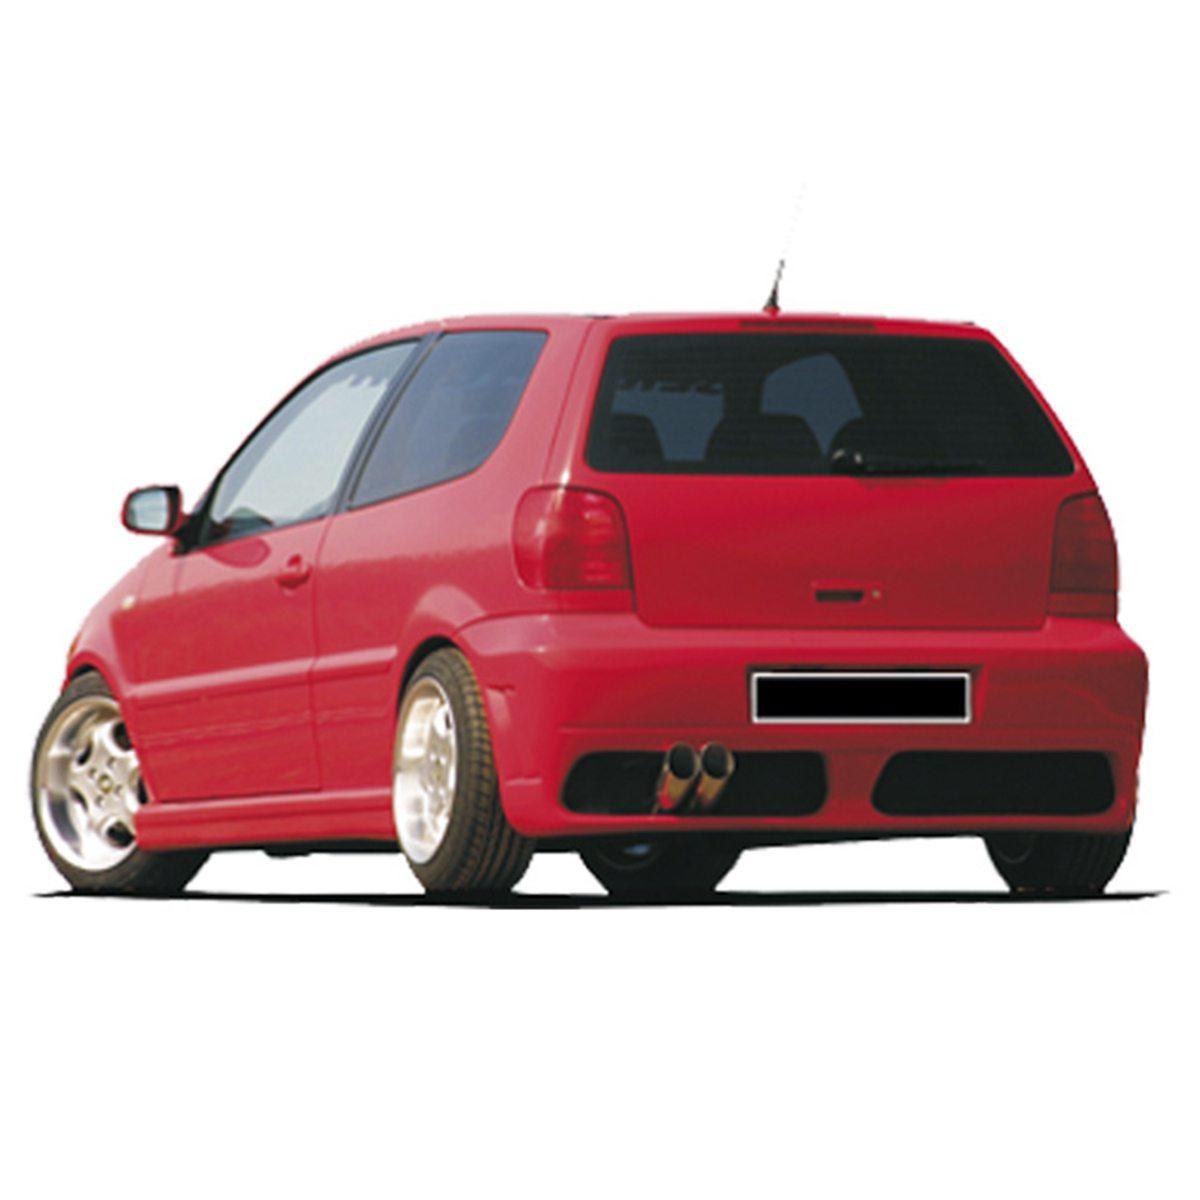 VW-Polo-6N-Tras-PCN122